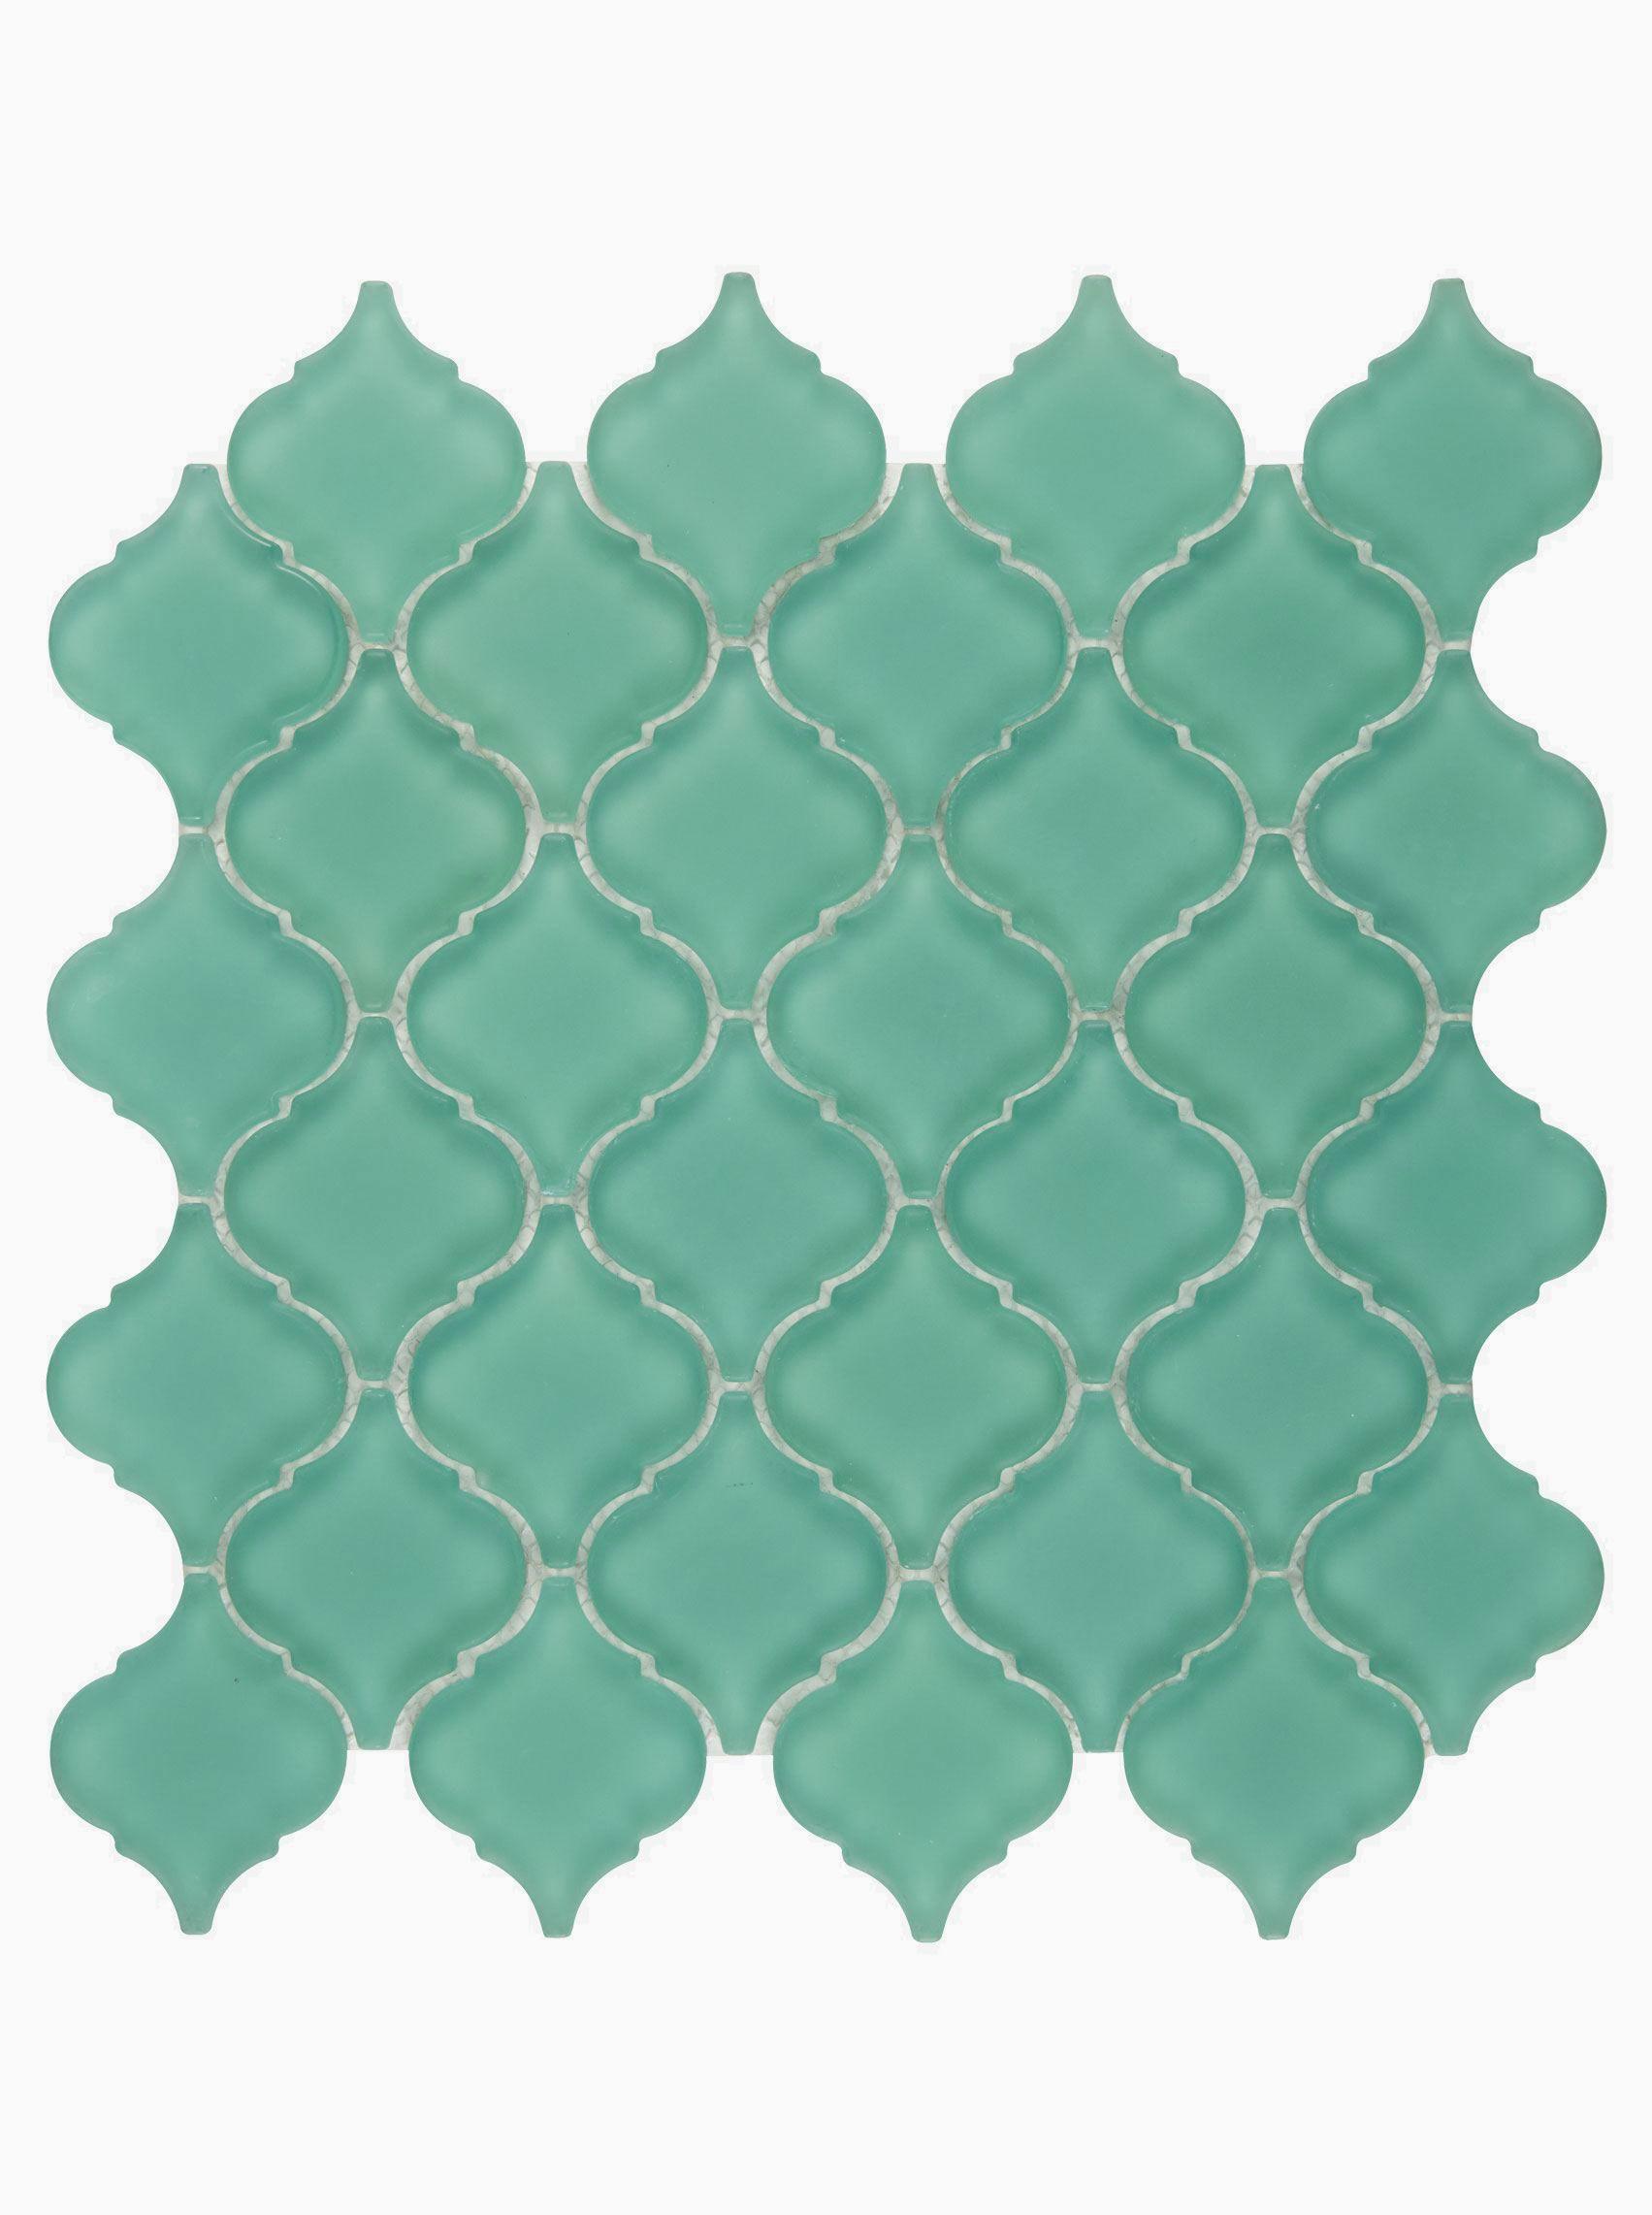 Byzantine Emerald Arabesque Mosaic